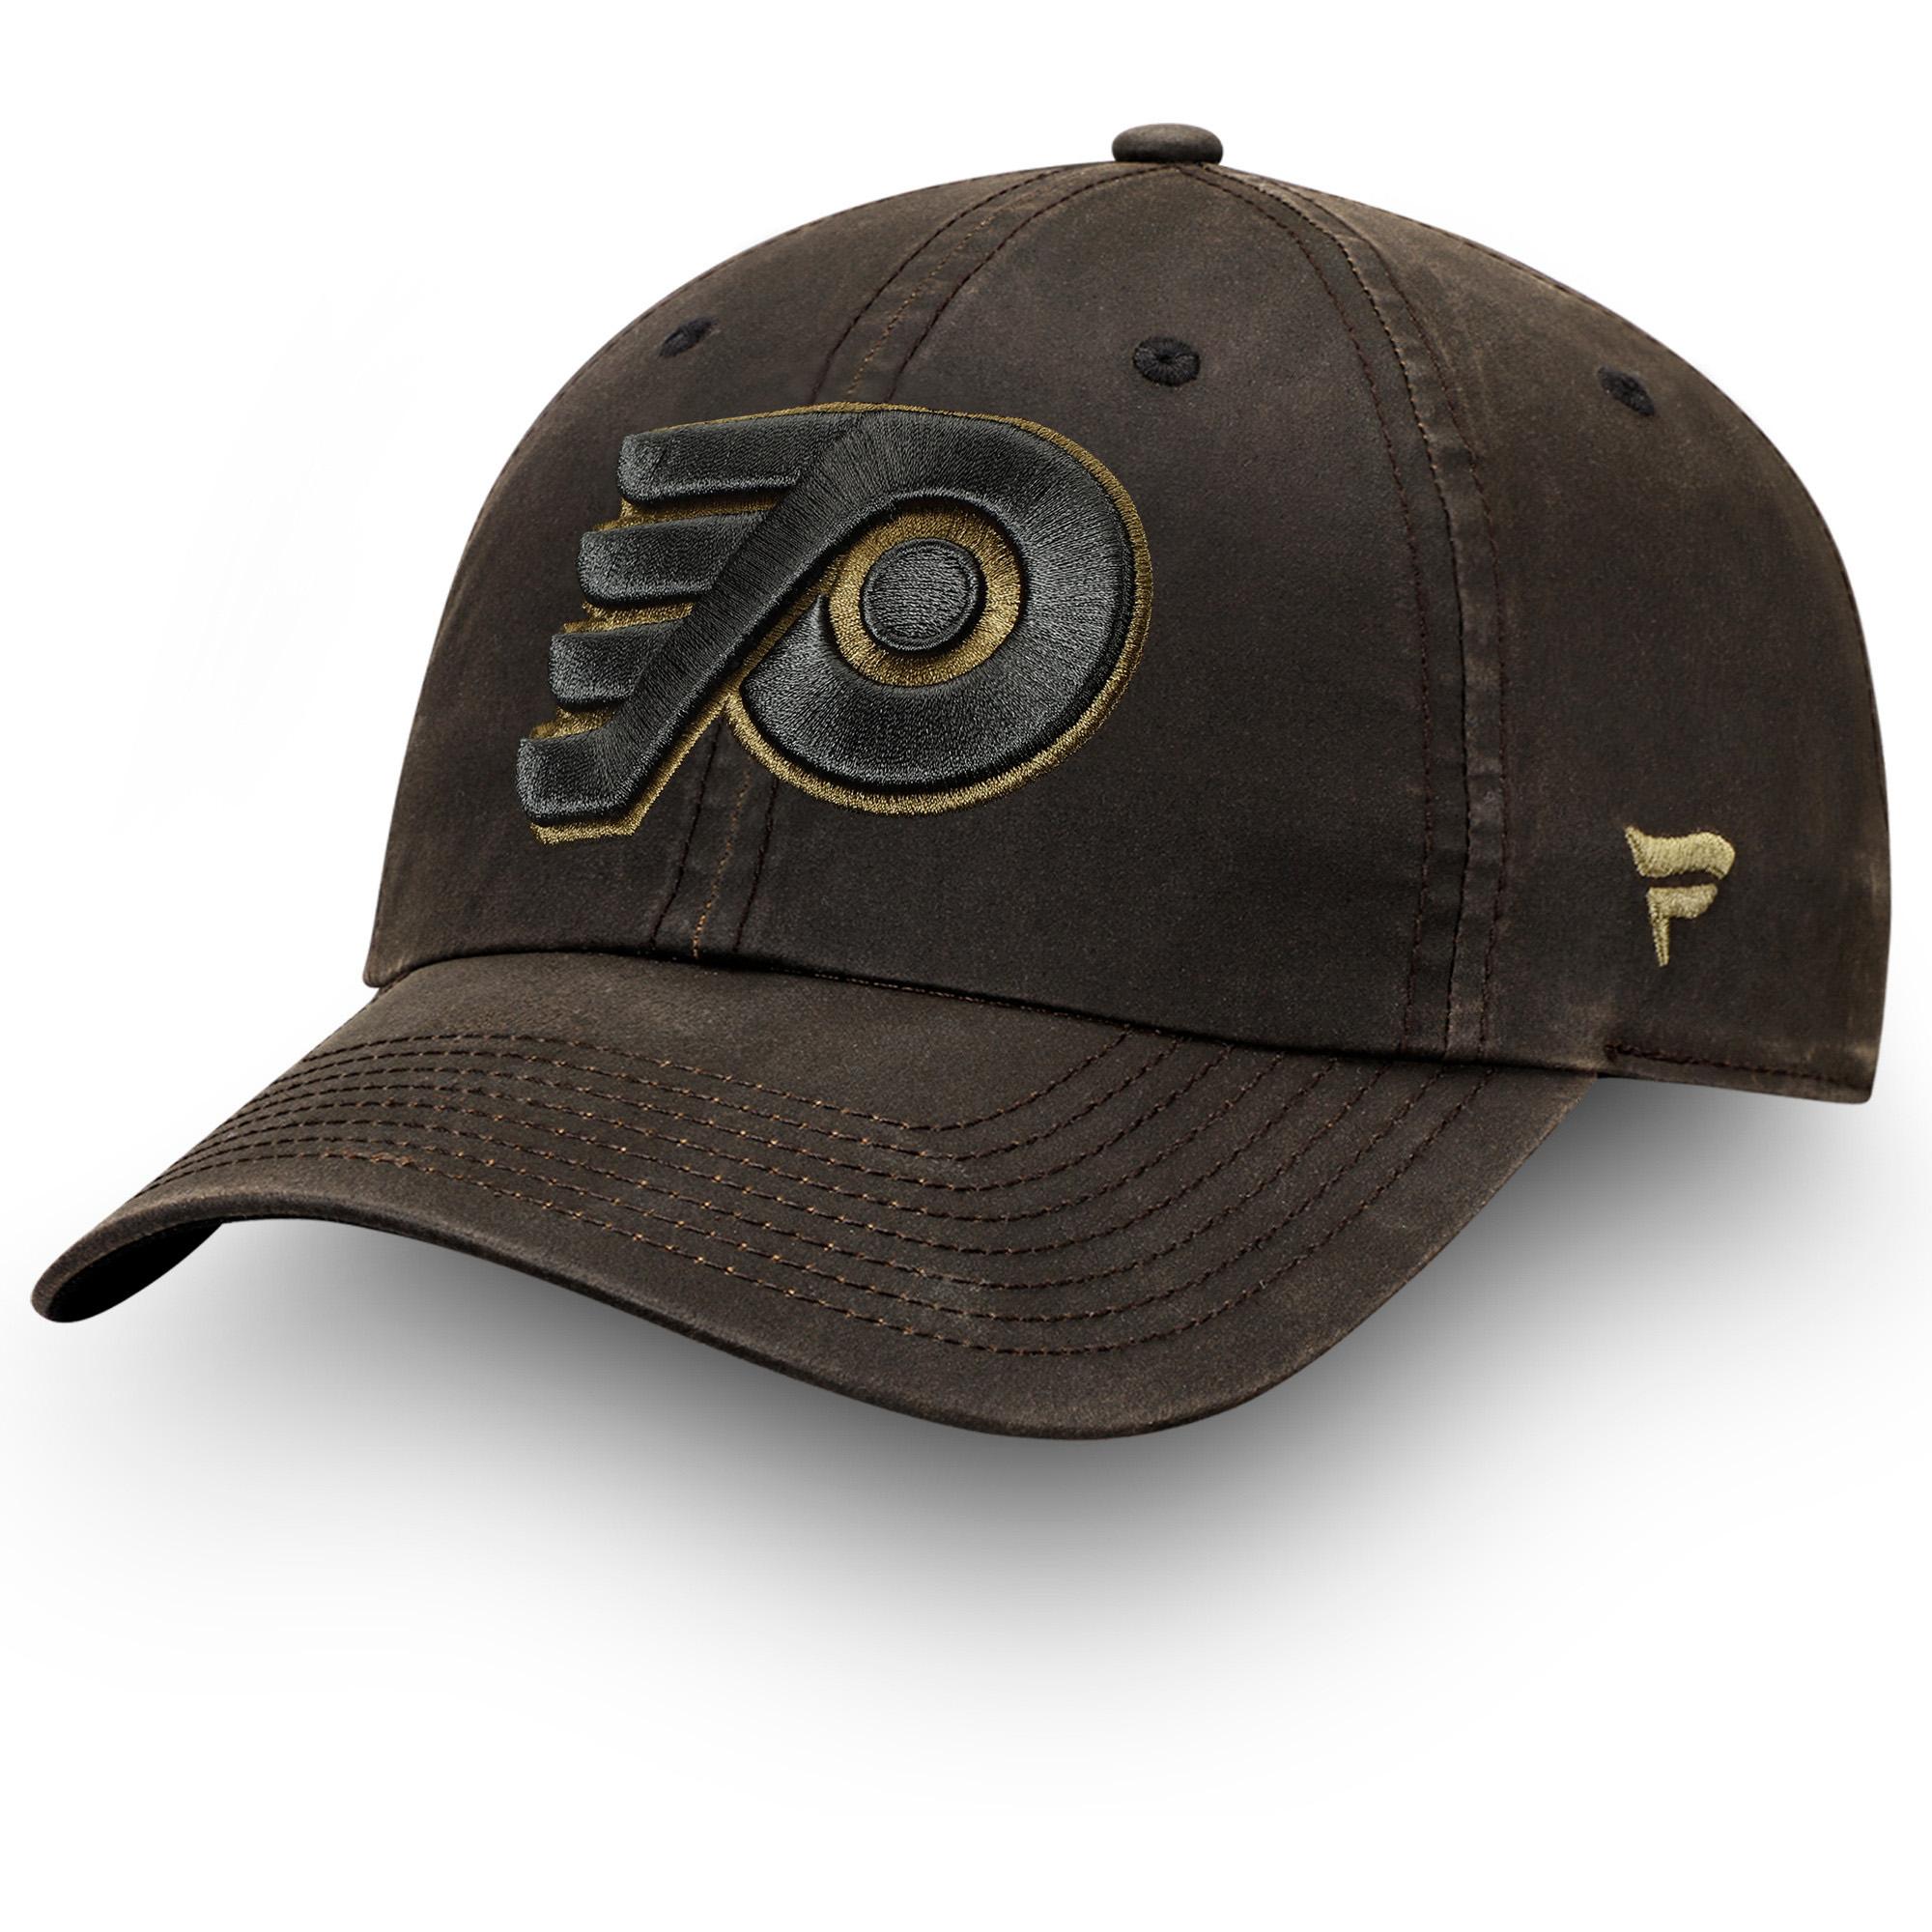 Philadelphia Flyers Fanatics Branded Lux Fundamental Adjustable Hat - Brown/Olive - OSFA